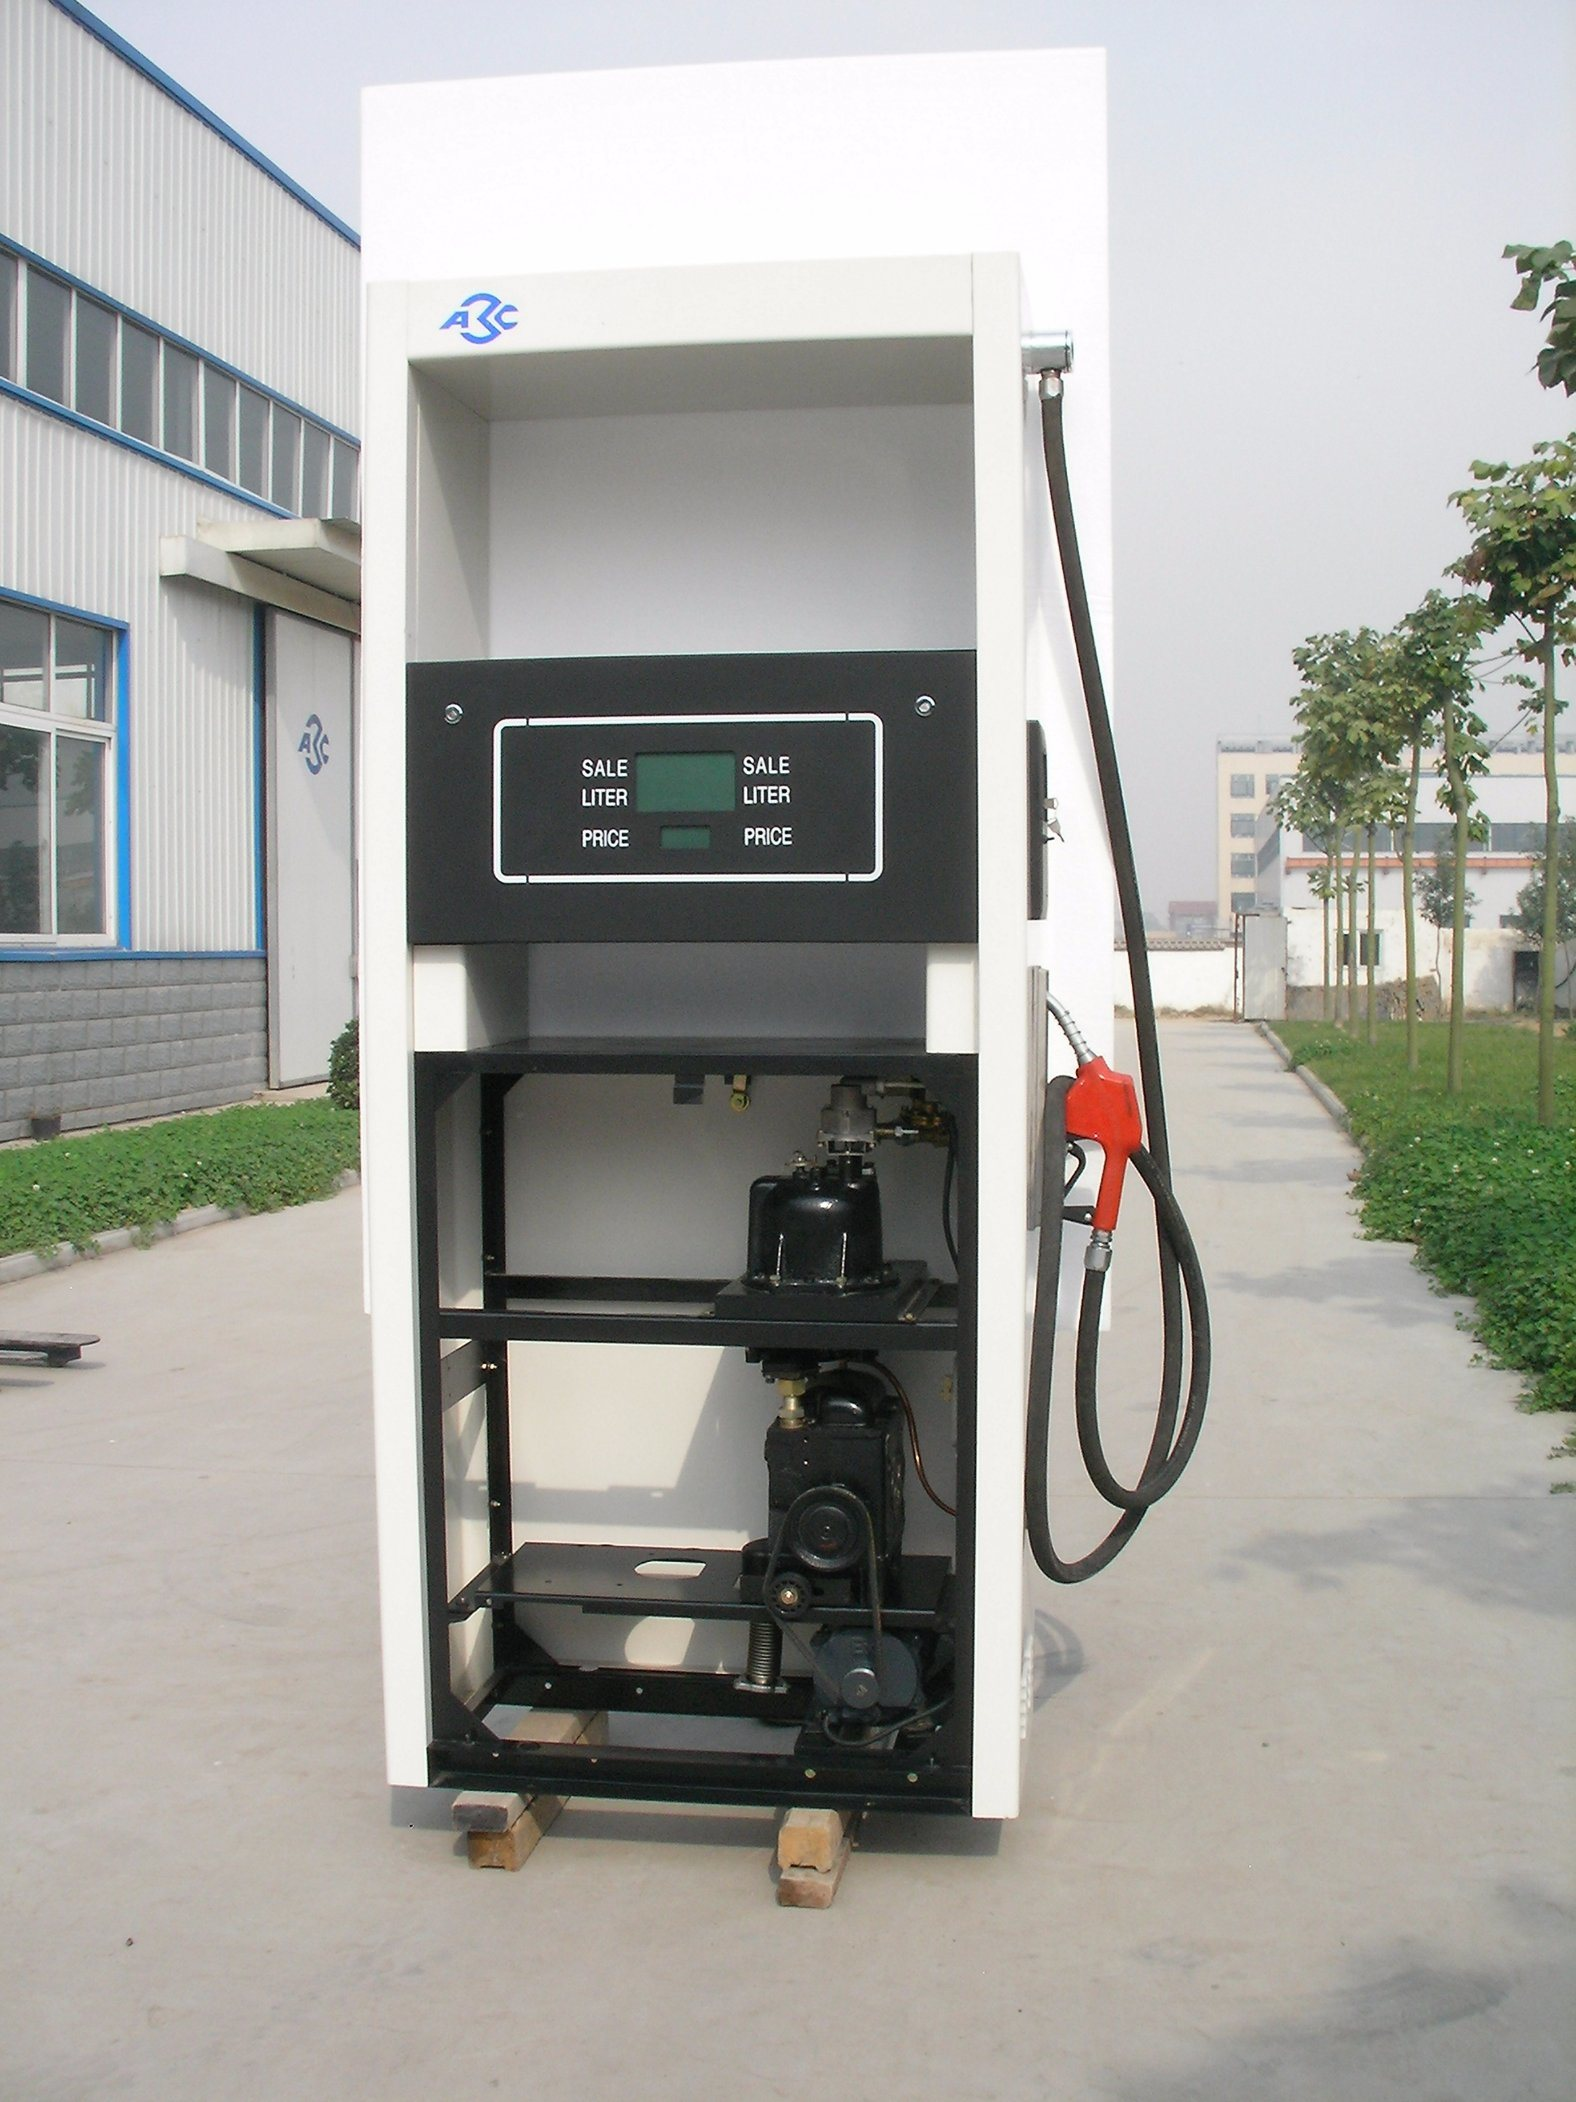 One Nozzle One Pump Gas Station Fuel Dispenser